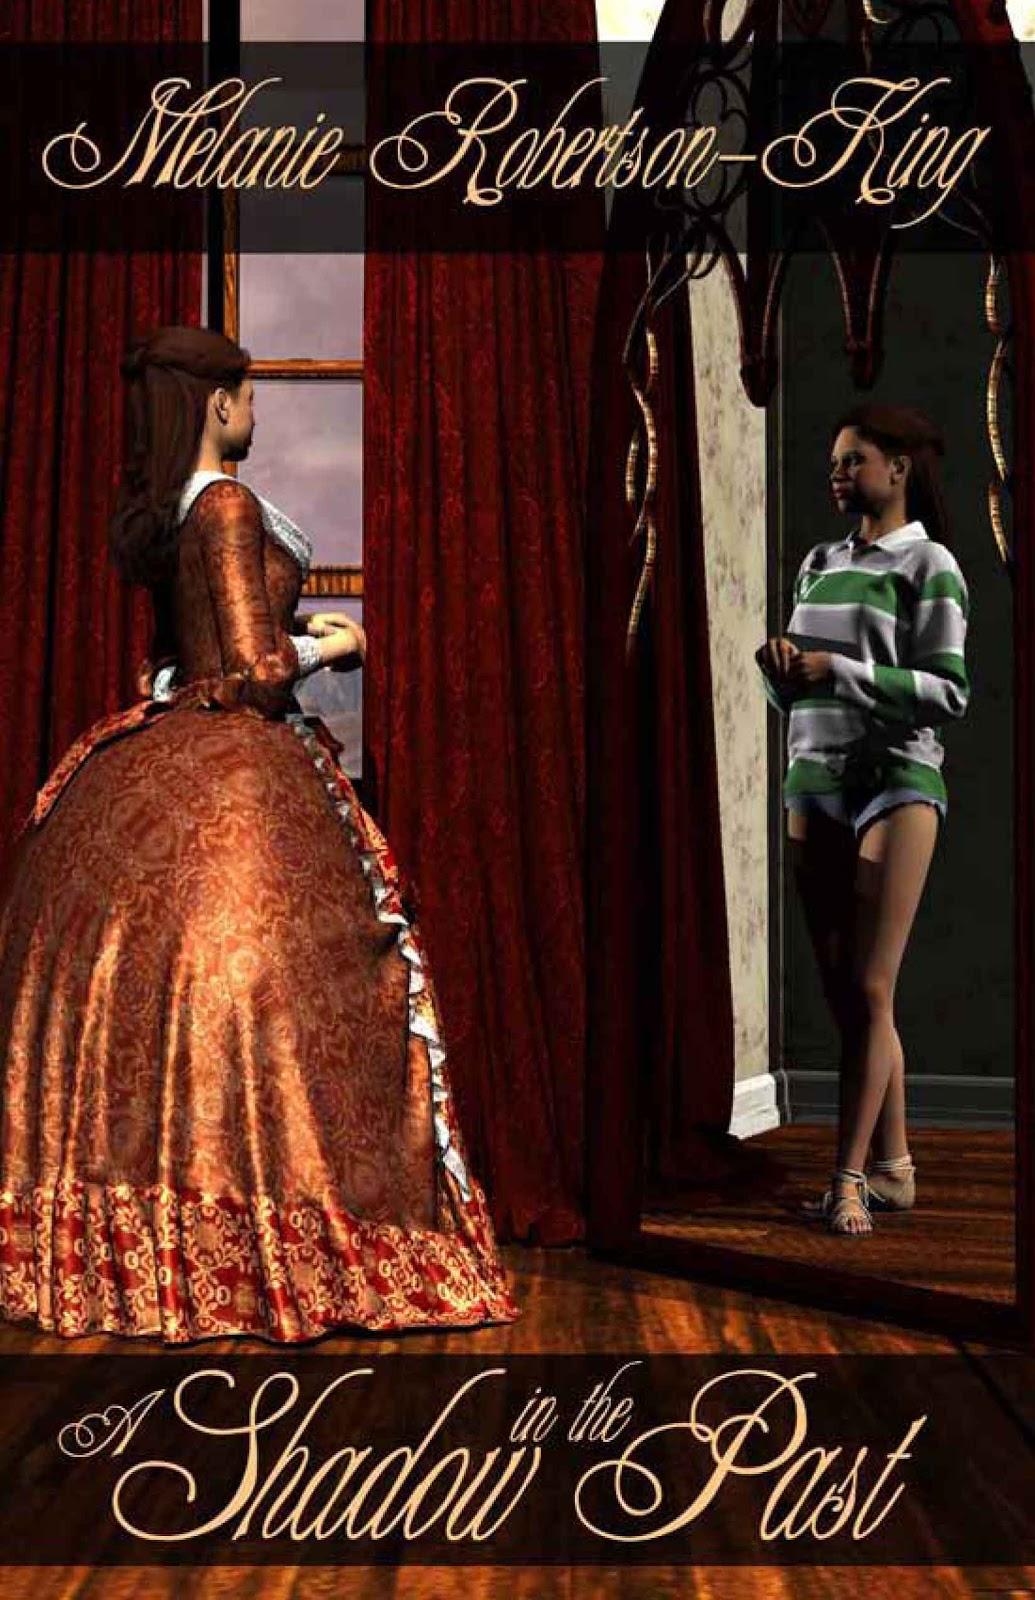 http://3.bp.blogspot.com/-1RwBE_yHAxs/UIUsywndRDI/AAAAAAAAAPA/aopHNOMpN0o/s1600/A-Shadow-in-the-Past-by-Melanie-Robertson-King.jpg